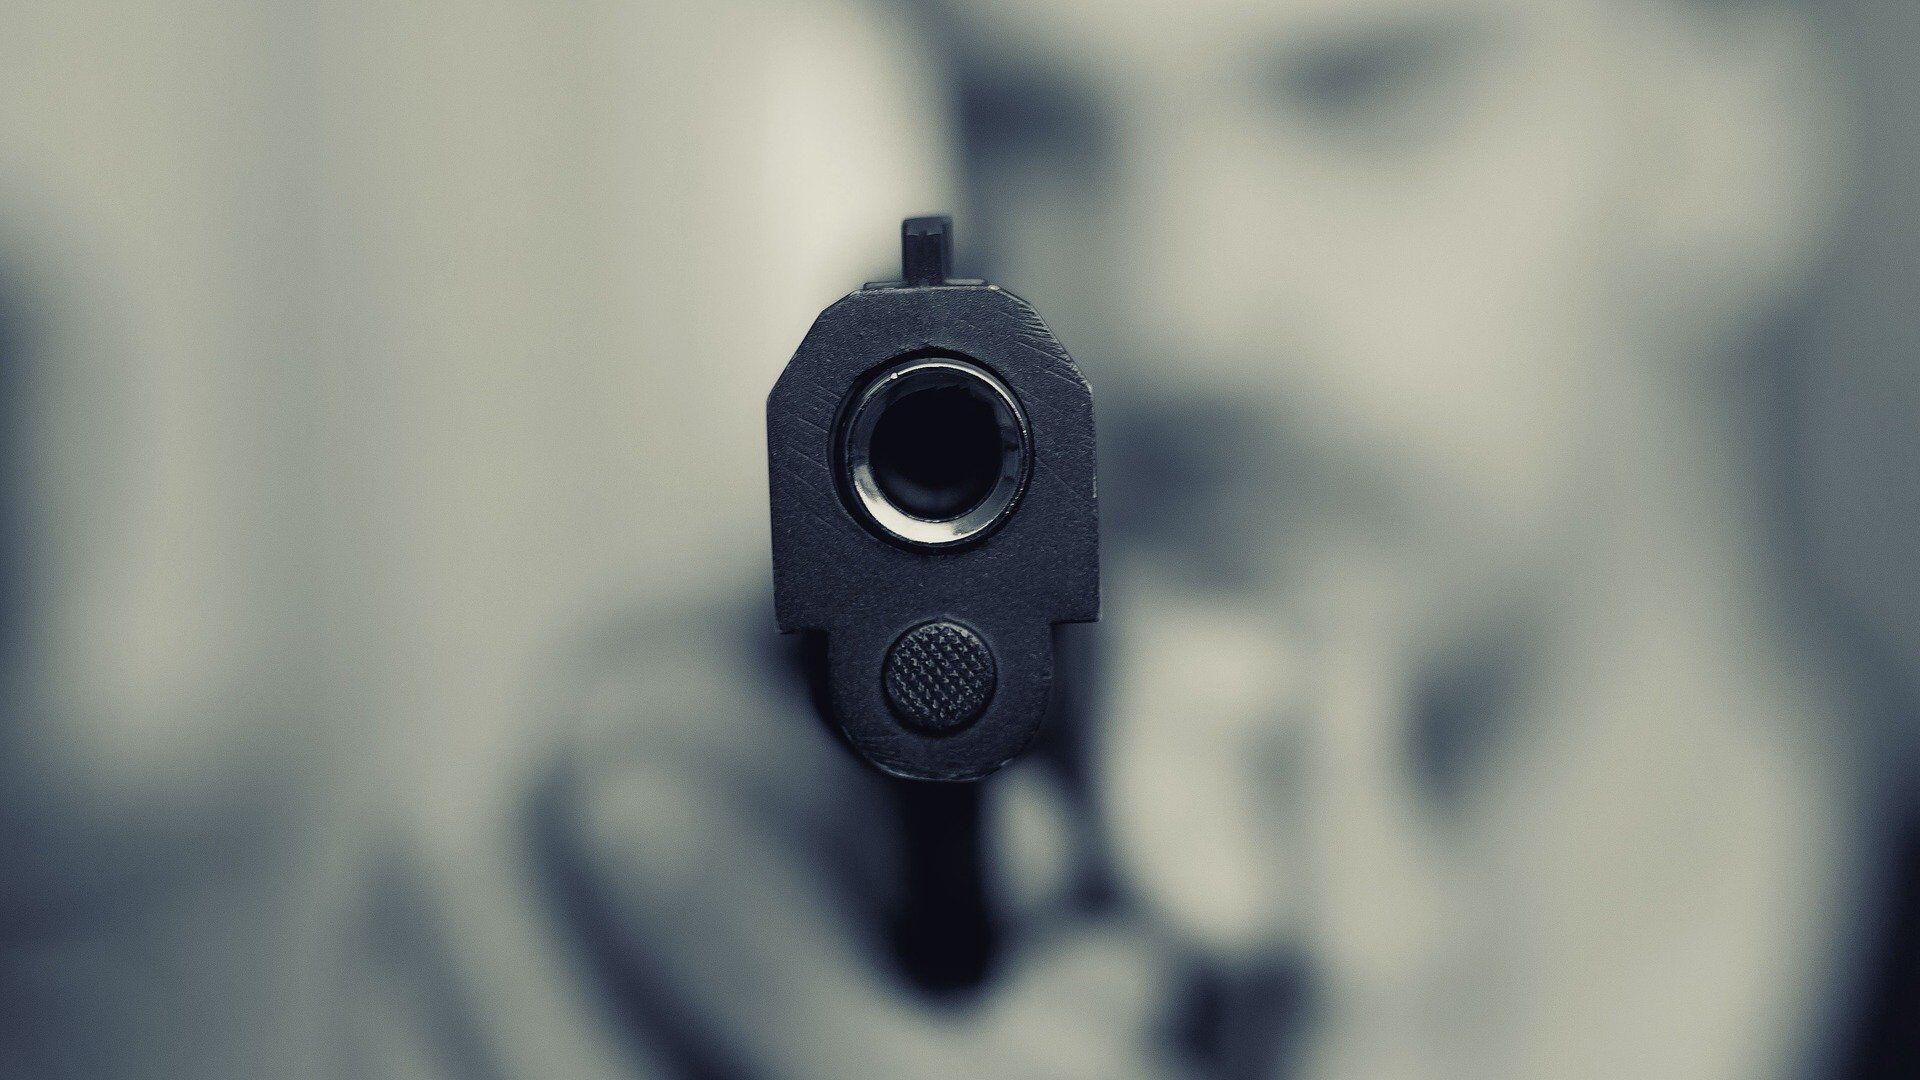 Una pistola (imagen referencial) - Sputnik Mundo, 1920, 14.10.2021